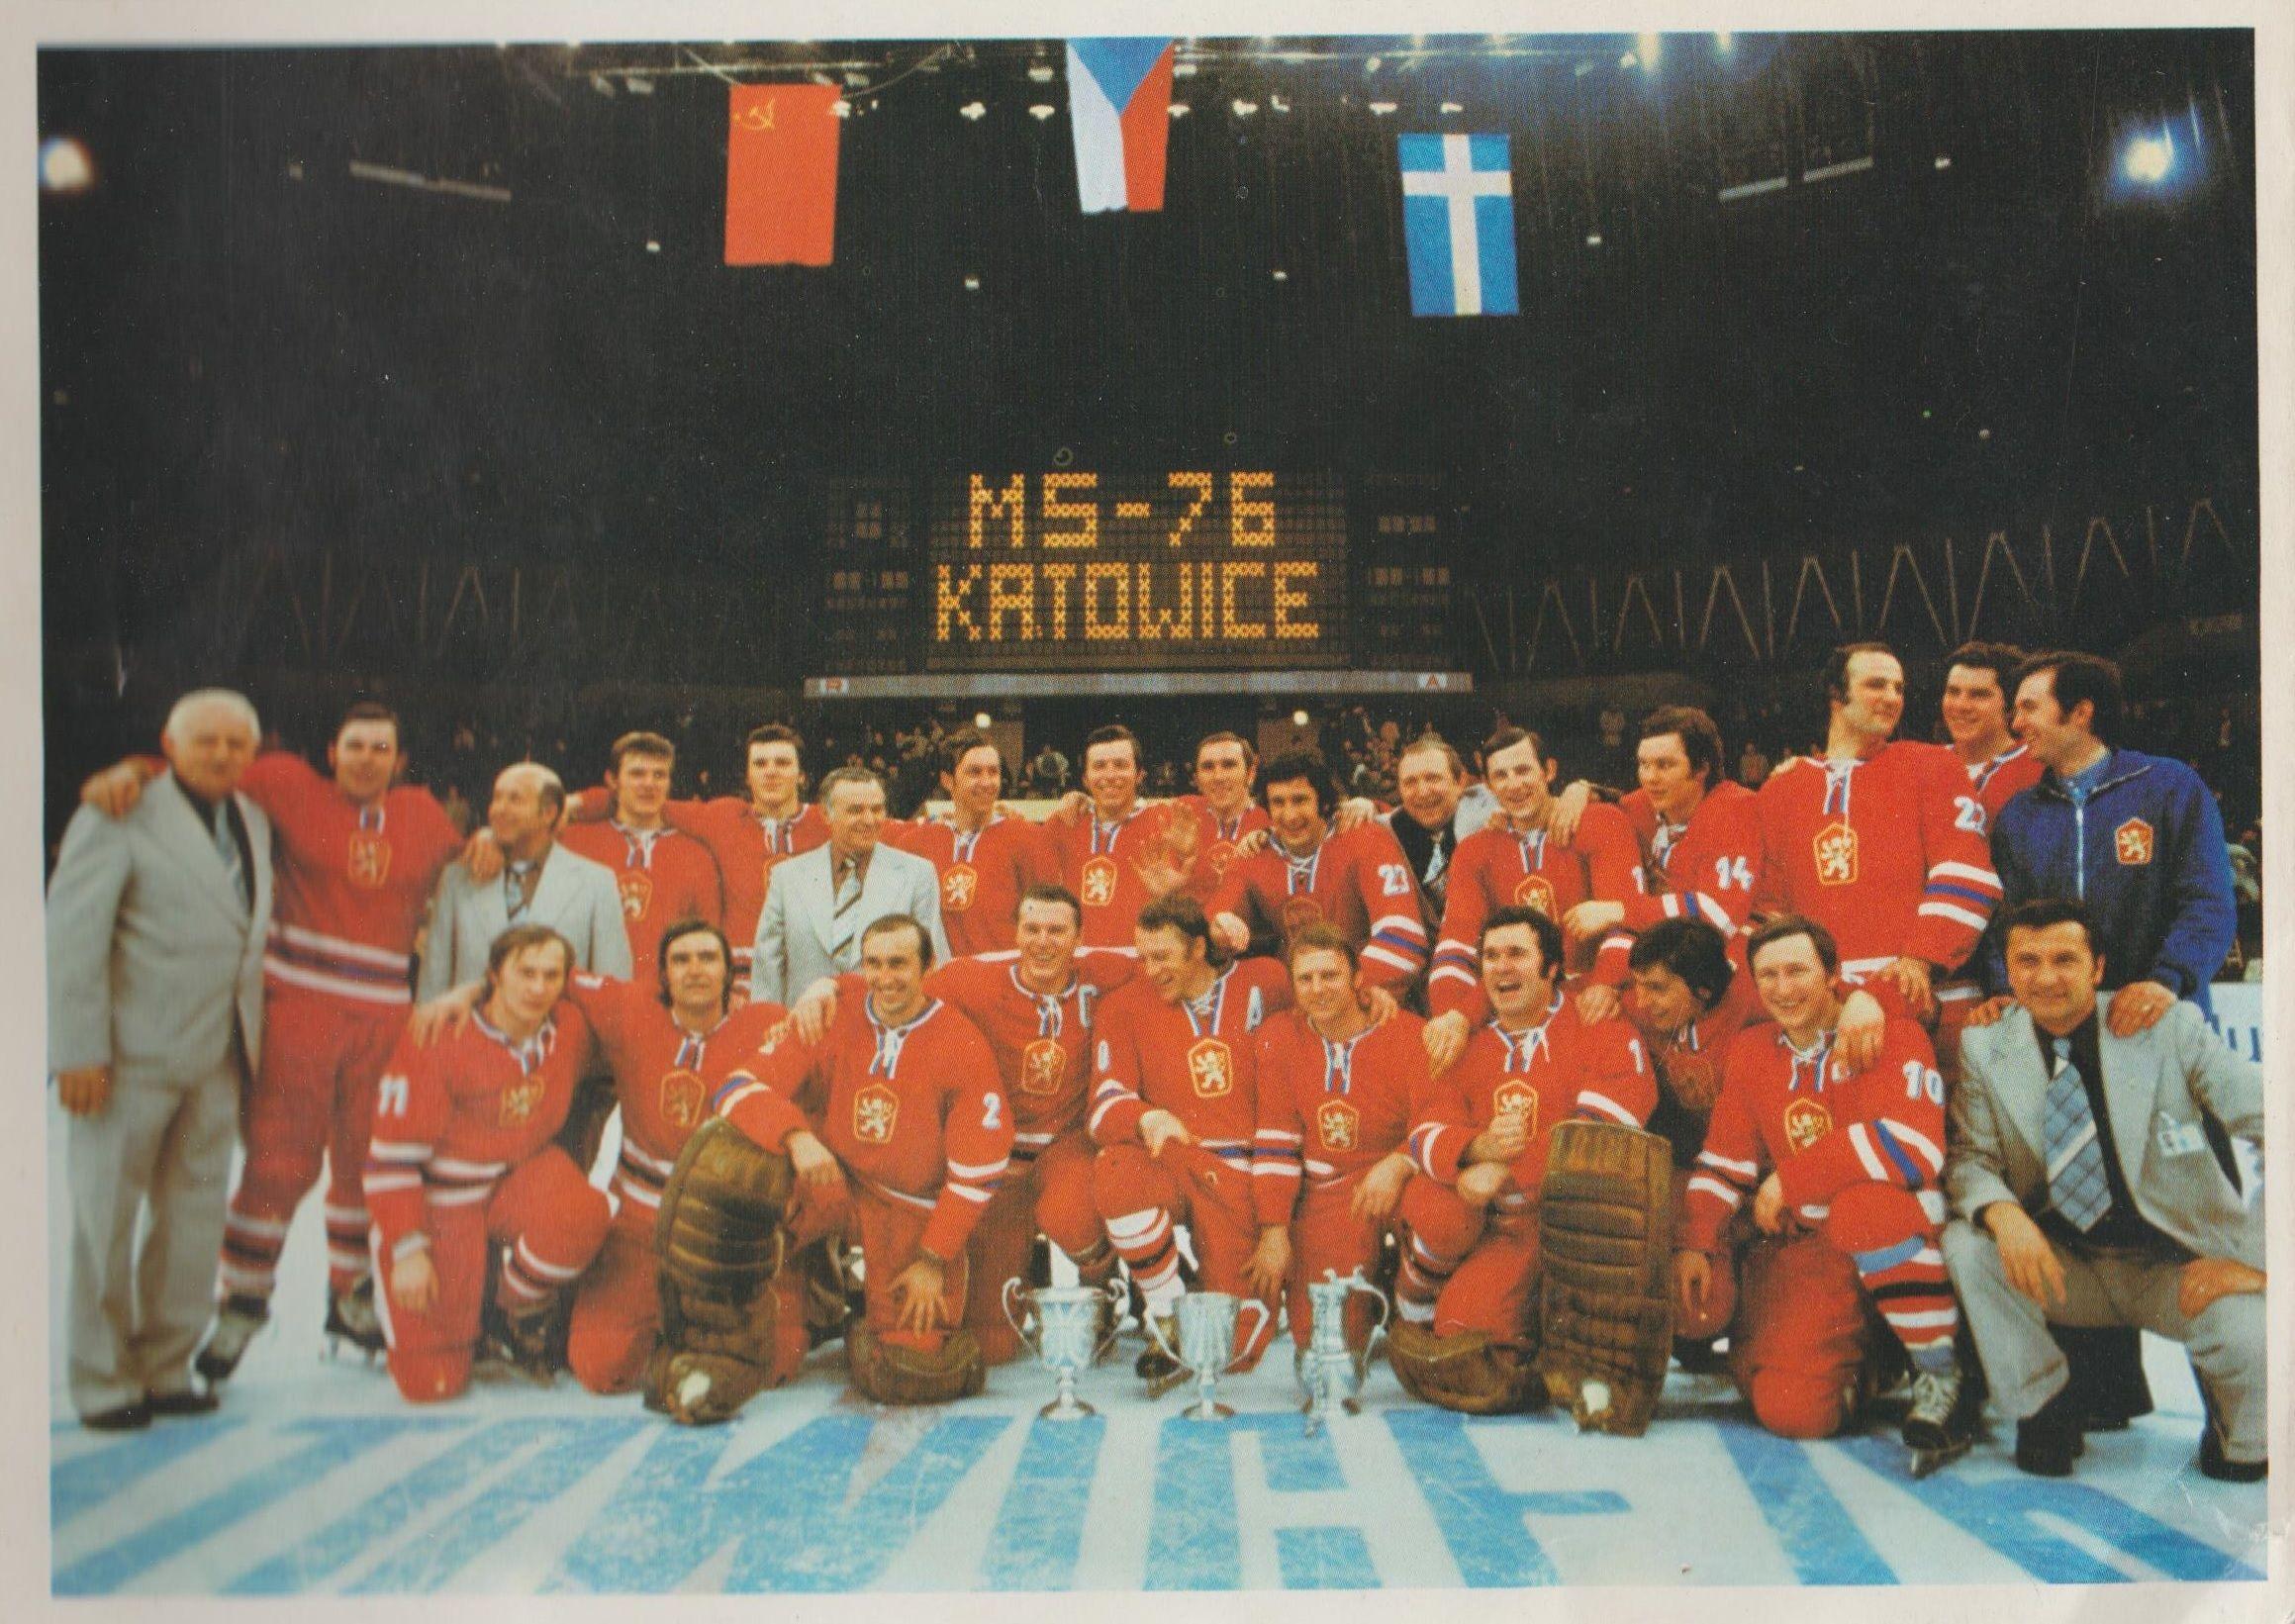 Stojaci Prezident ľadoveho Hokeja Zdenek Andrst Jiri Bubla Technicky Manazer Oldrich Fairaizl Marian Stastny Peter Stastny Katowice World Icon Hockey Puck